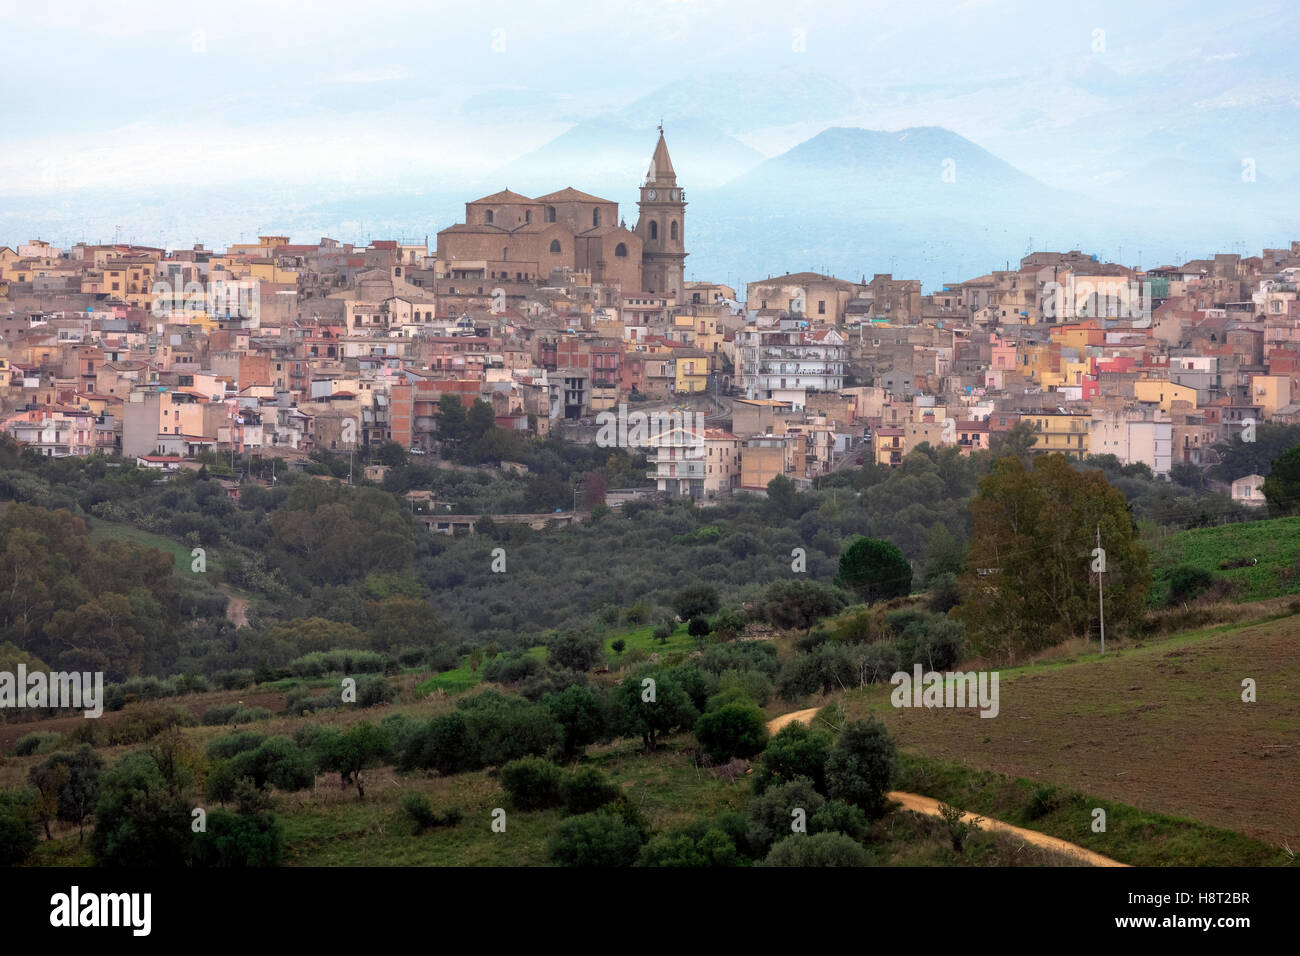 Regalbuto, Enna, Sicily, Italy - Stock Image